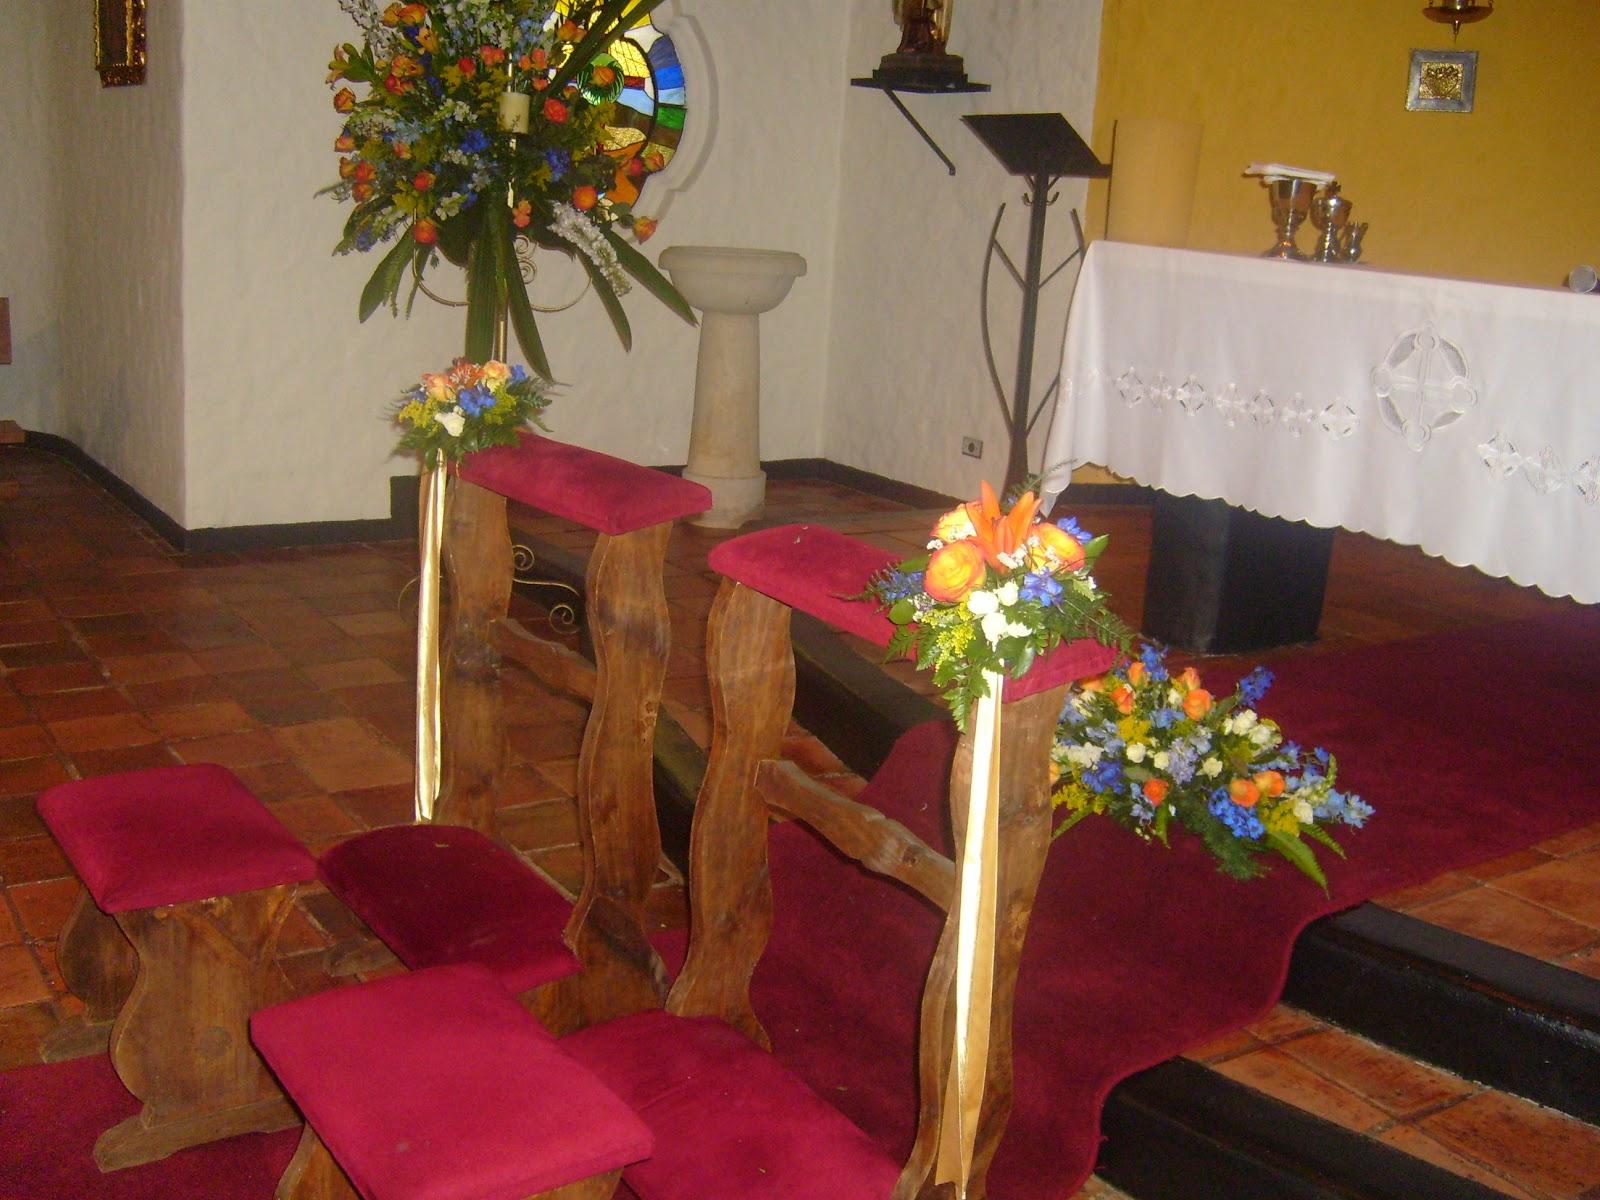 Decoraci n floral aura rosa camacho matrimonio flores naranja - Camacho decoracion ...